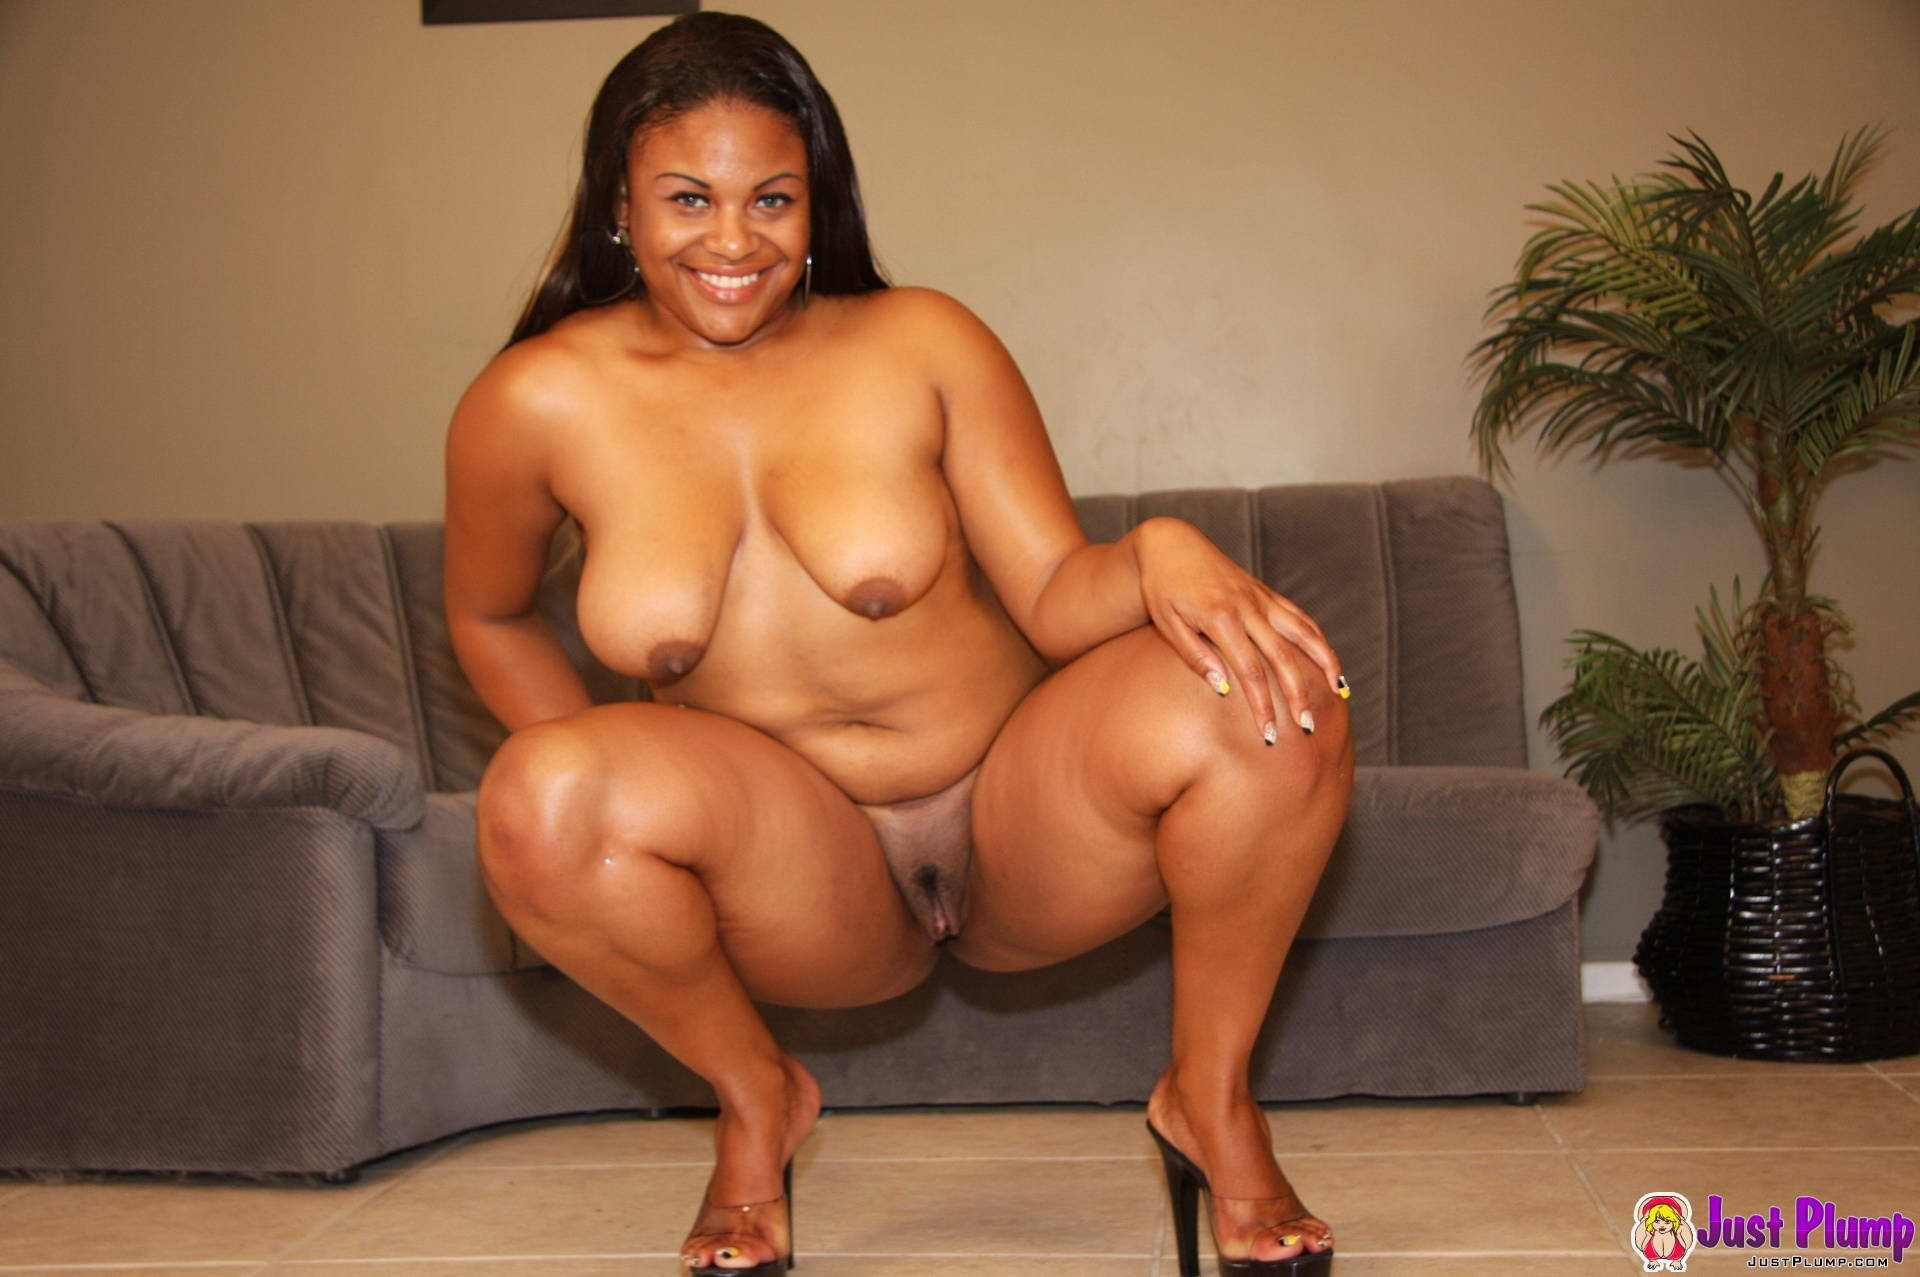 Black ass squatting naked